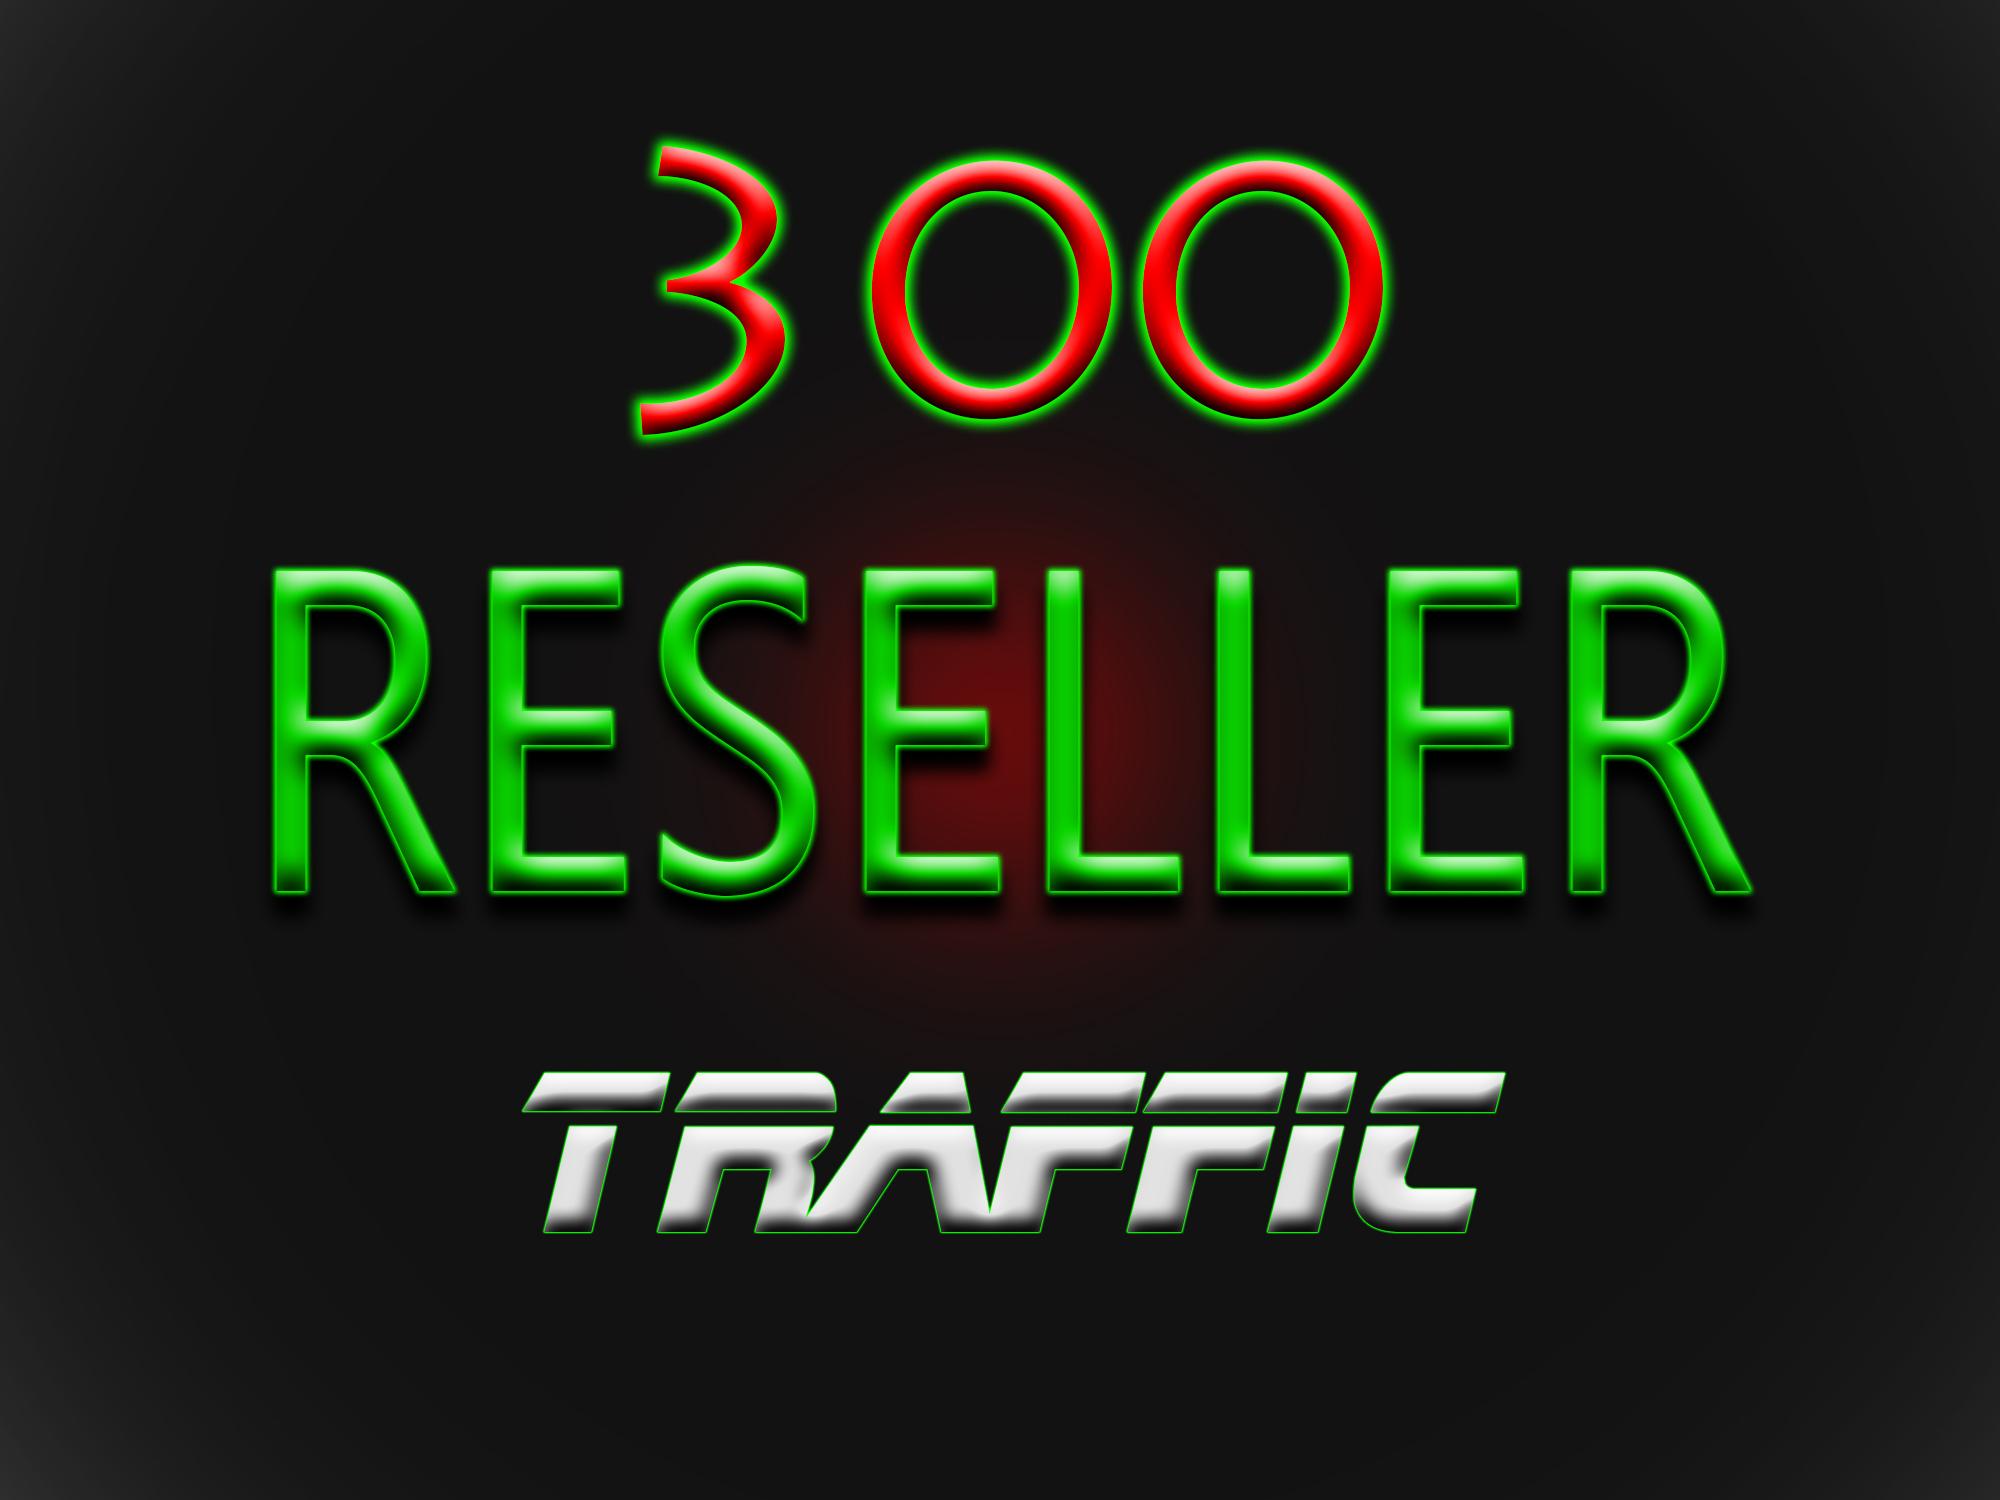 make you Web Traffic RESELLER 300